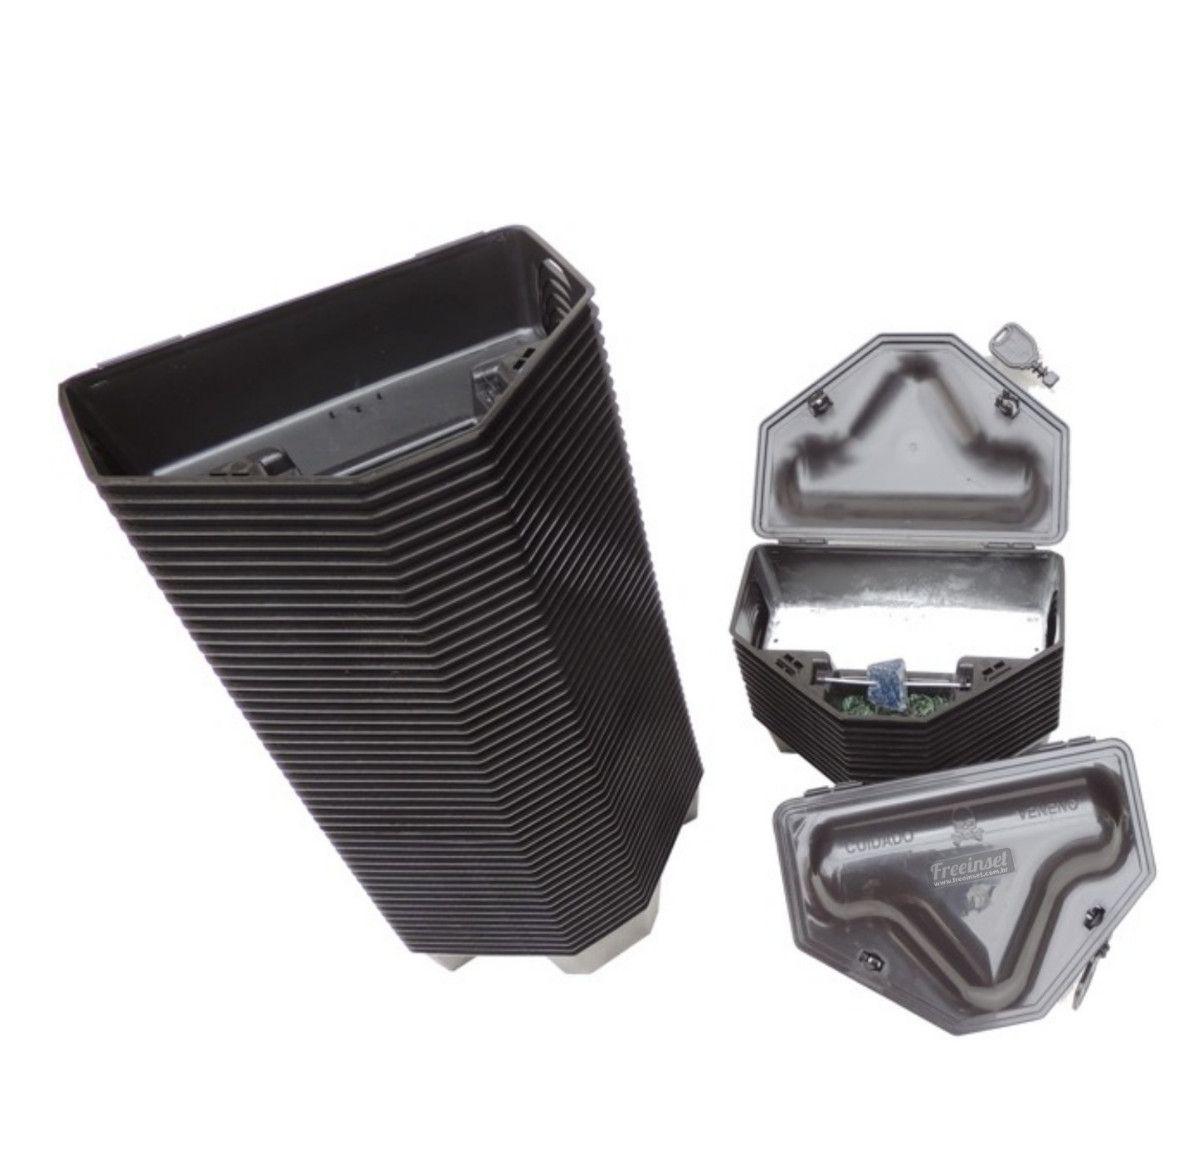 Kit 59 Porta Isca Com 2 Chaves - Duplo Travamento